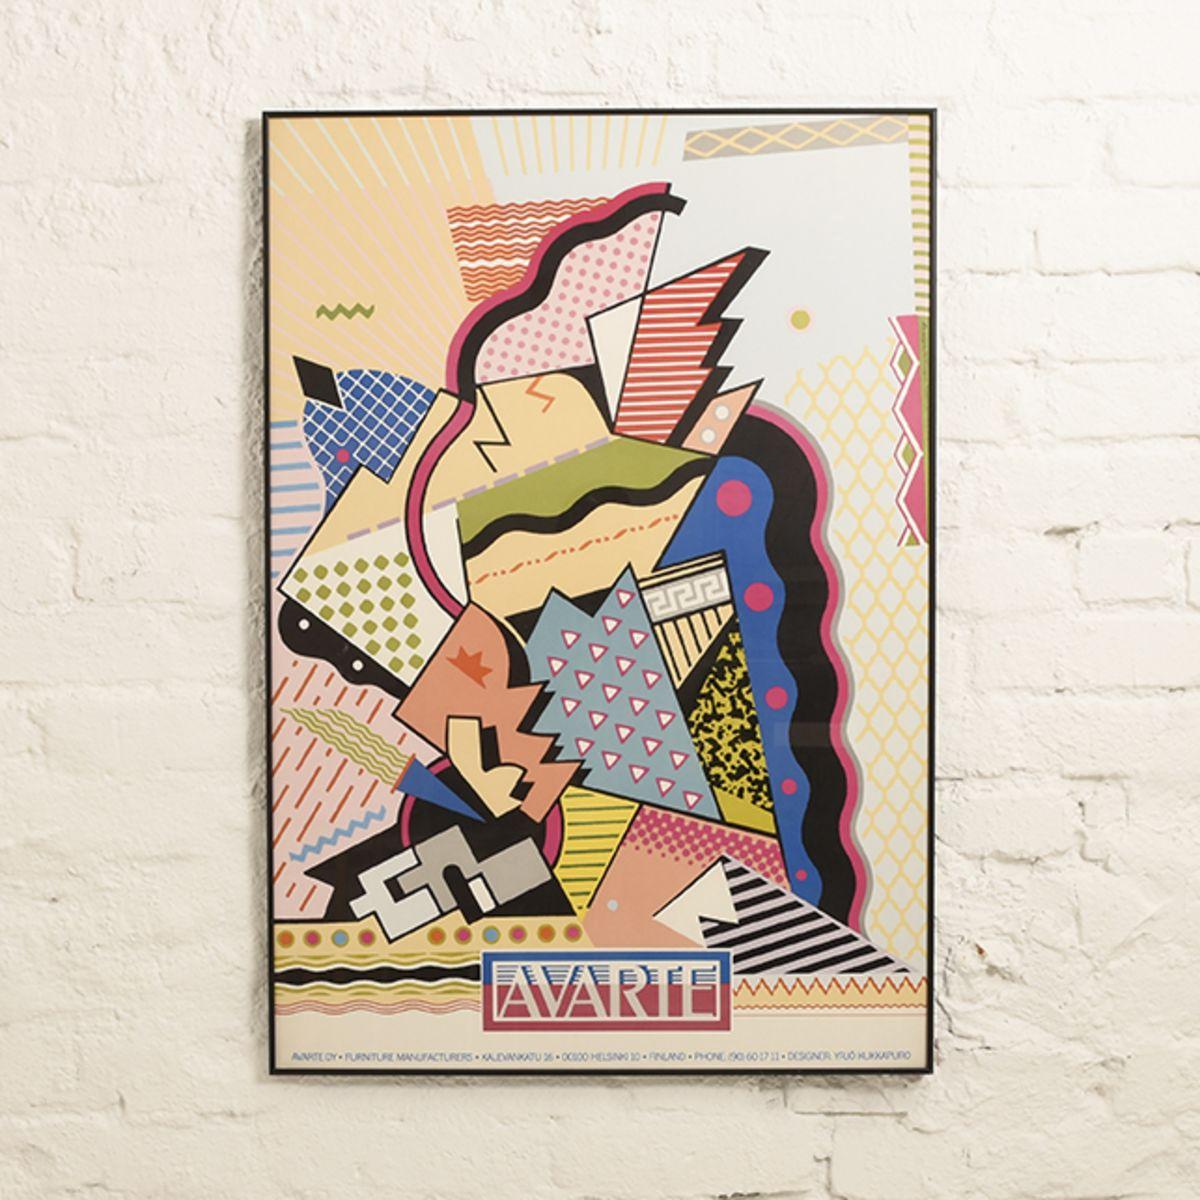 Kukkapuro-Yrjö-Atarte-Poster